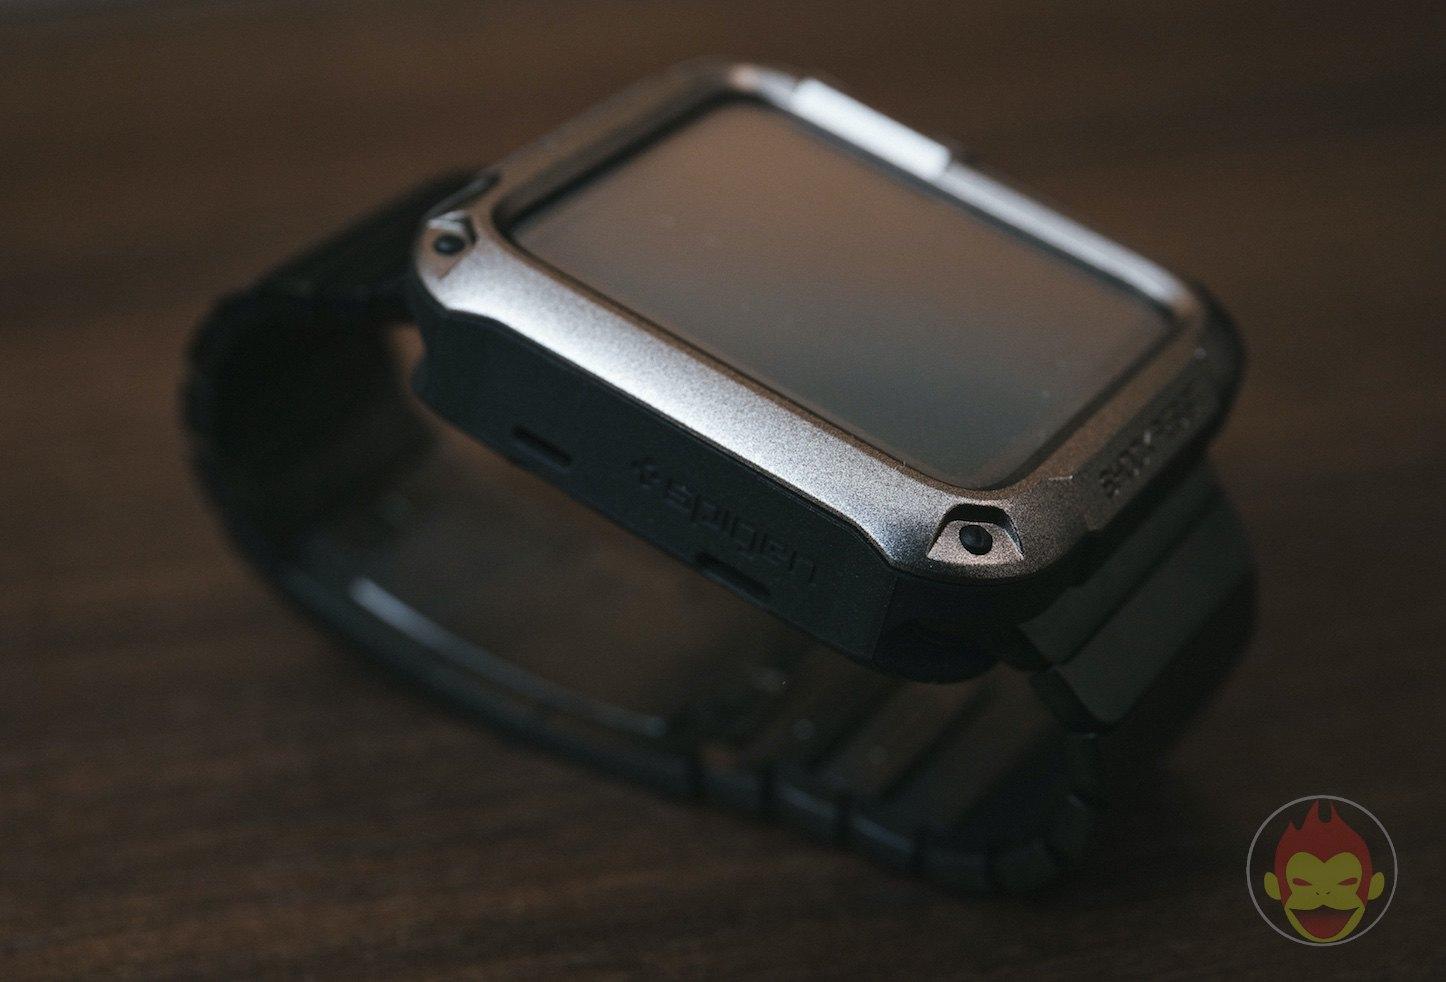 Spigen-Touch-Armor-Apple-Watch-Case-06.jpg